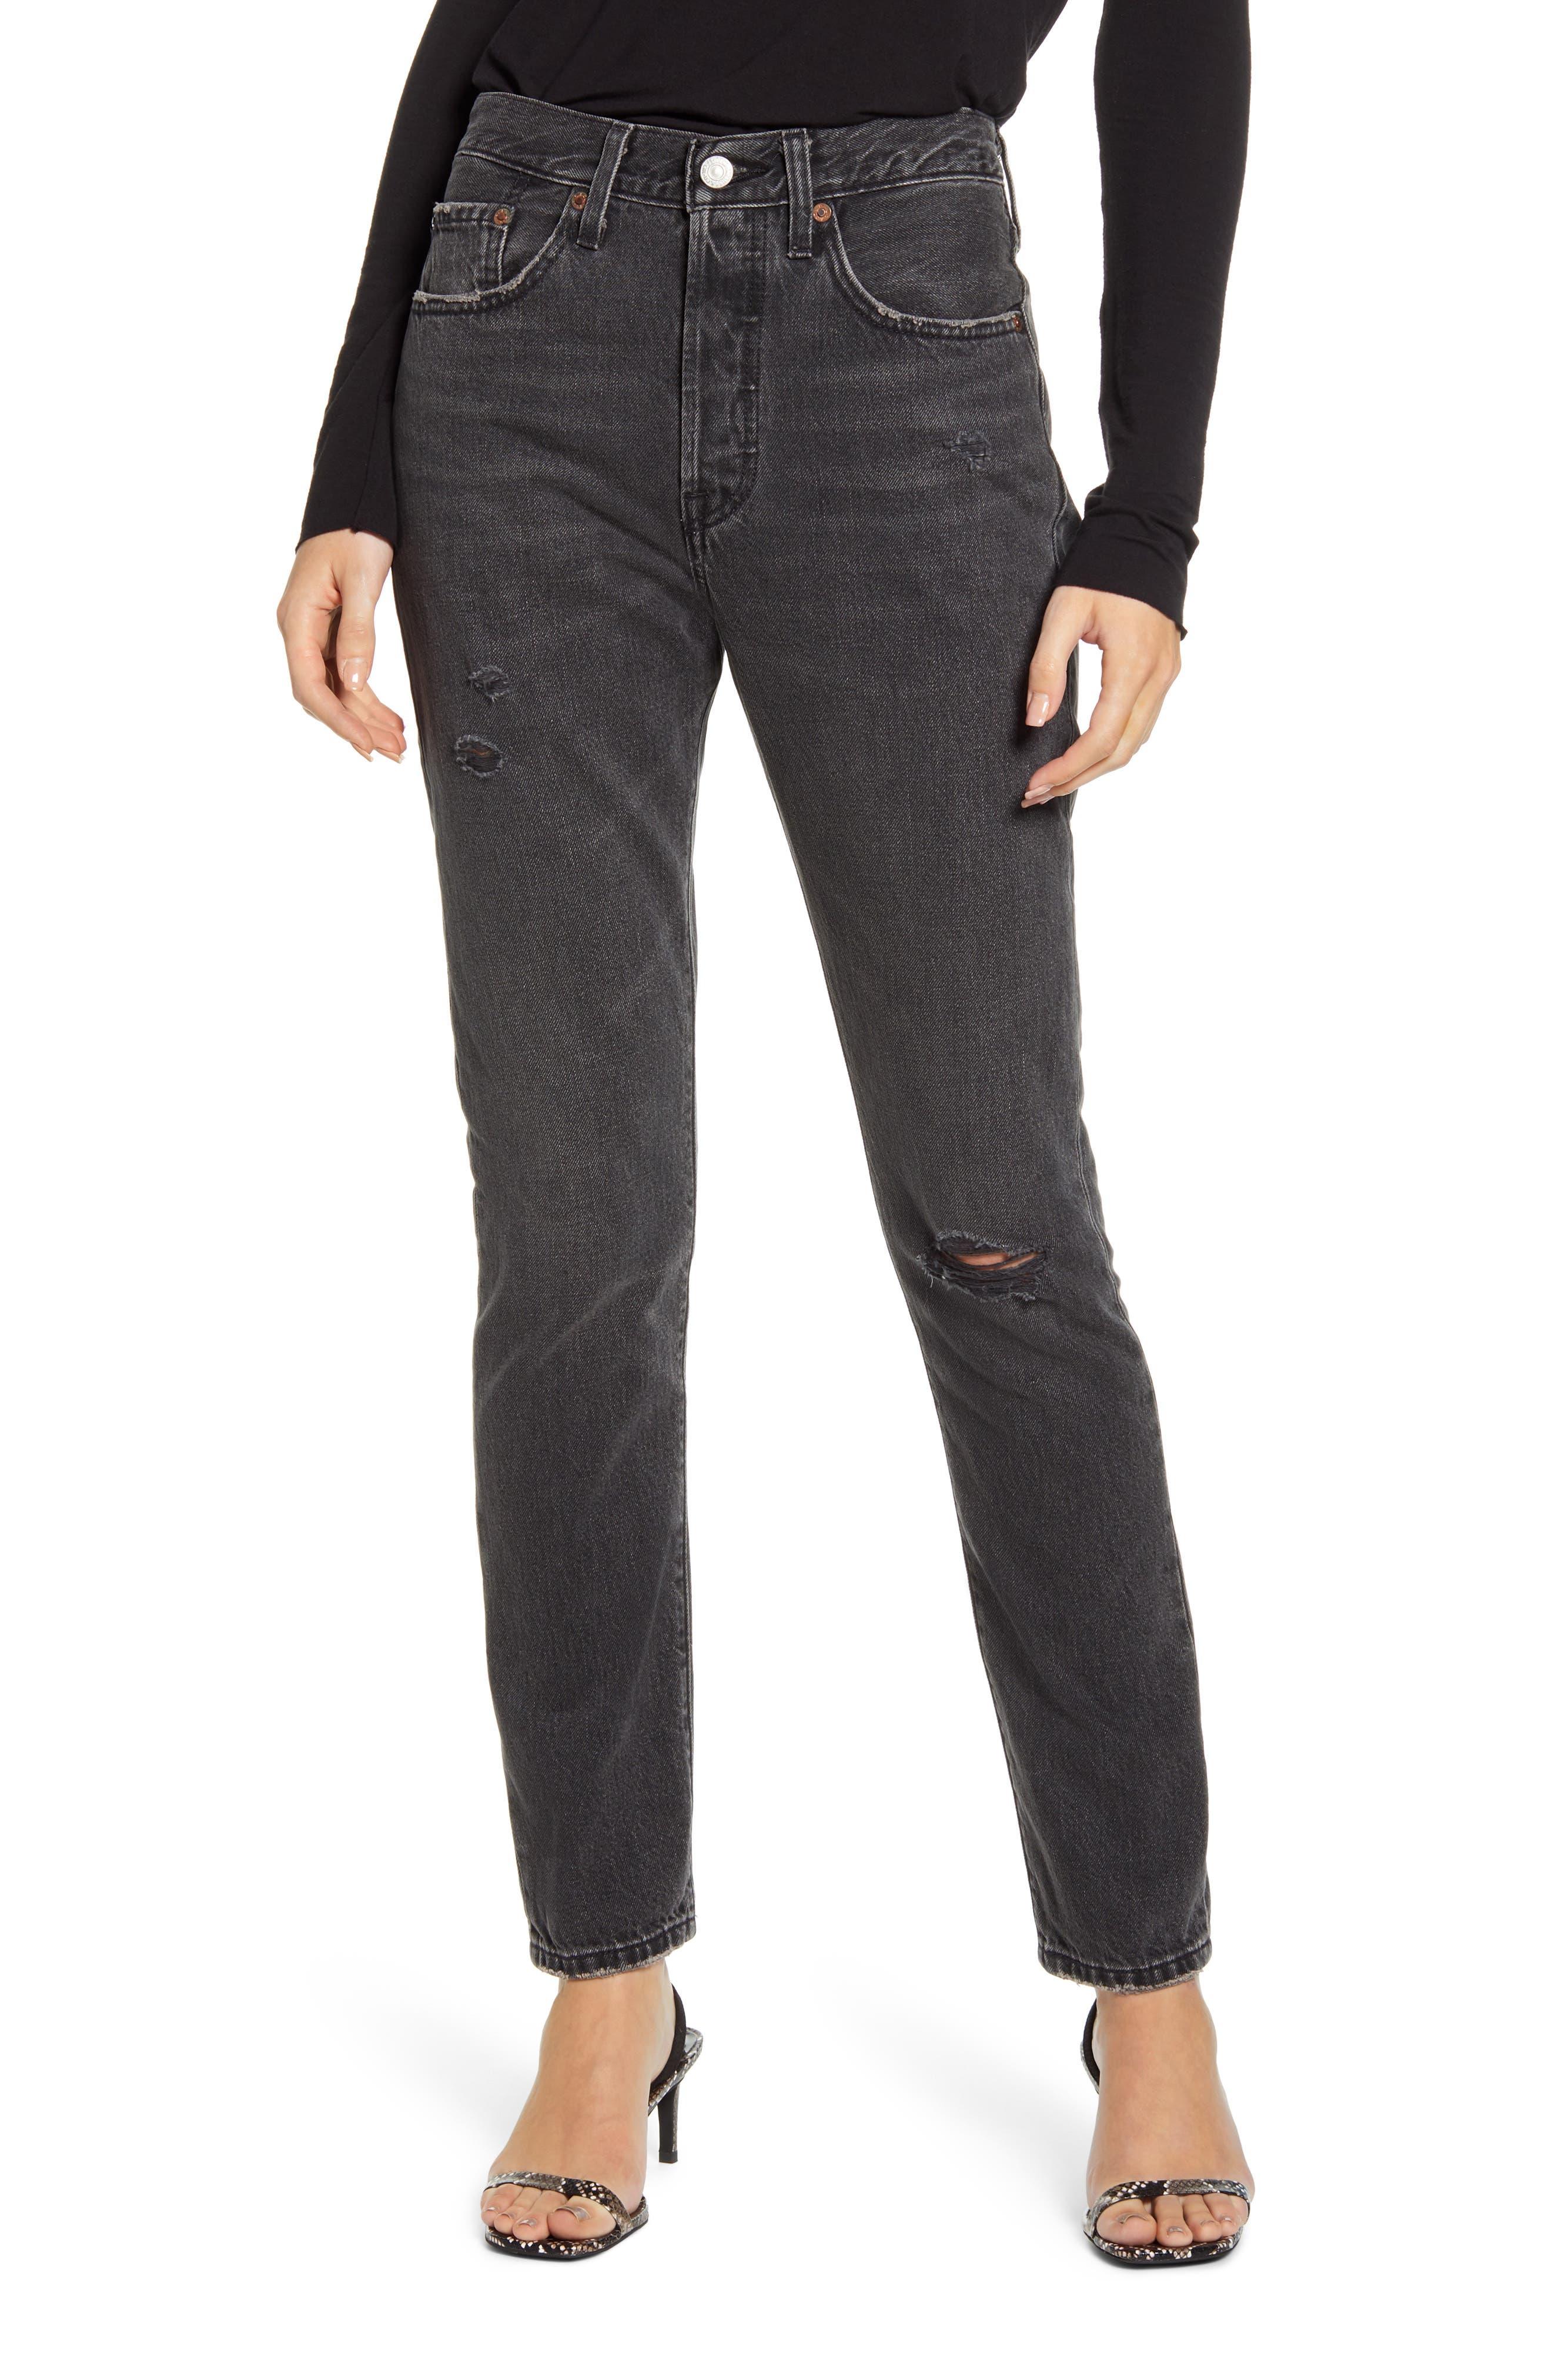 Women's Levi's 501 High Waist Ripped Skinny Jeans,  23 x 28 - Black